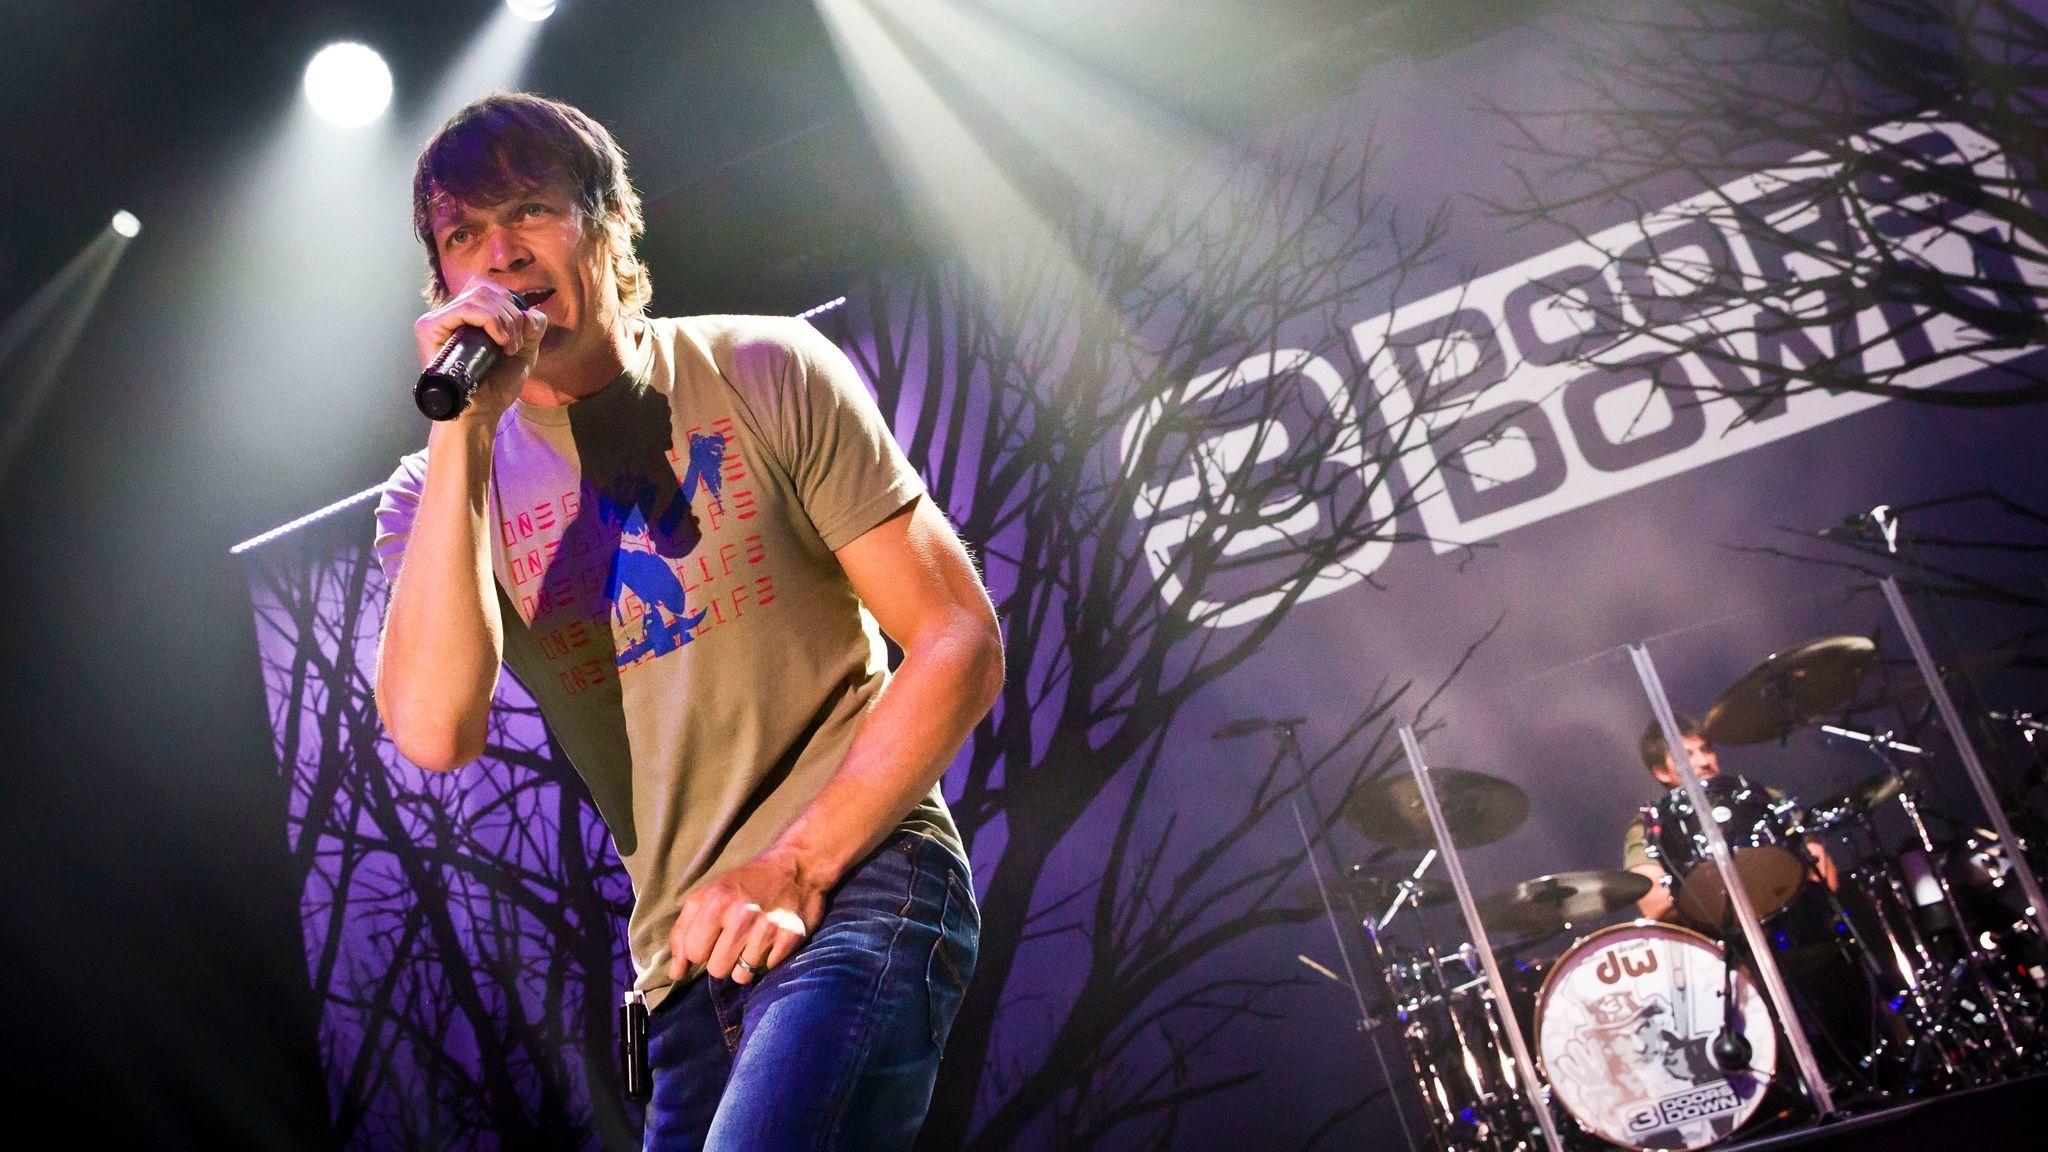 Singer Brad Arnold of 3 Doors Down performs in Berlin in 2016.